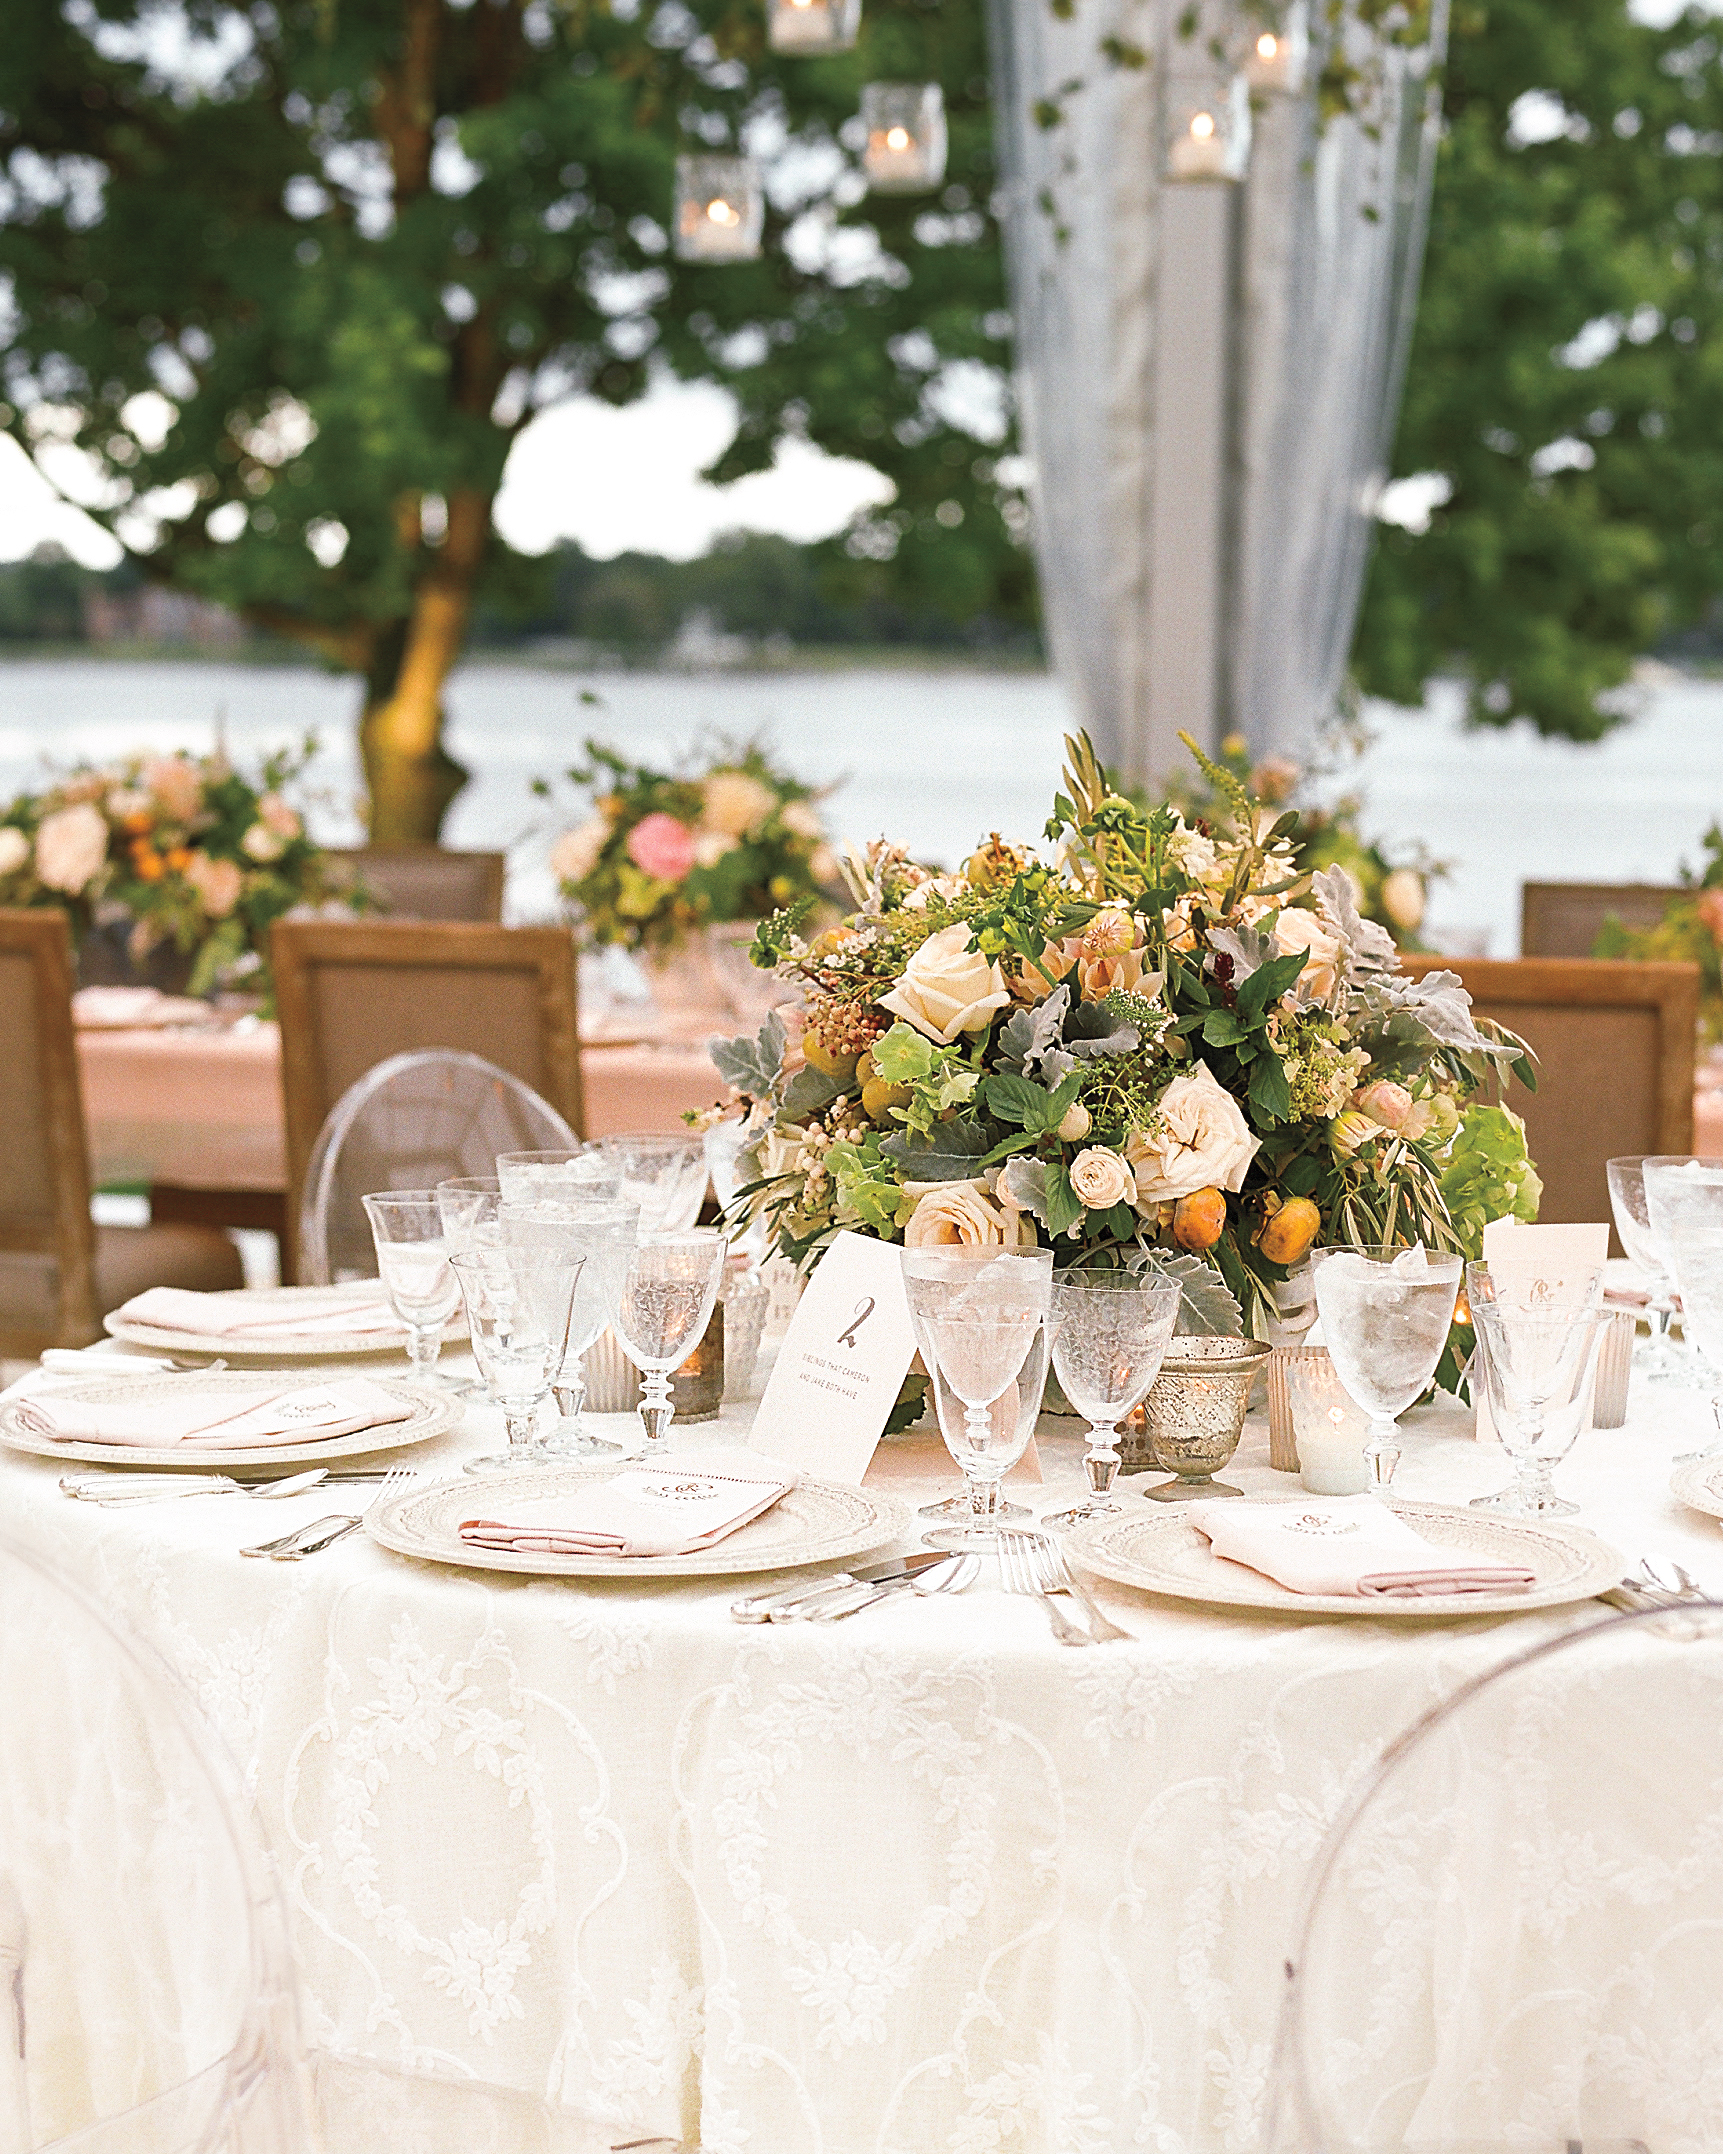 cameron-jake-wedding-maryland-0941-s112481.jpg